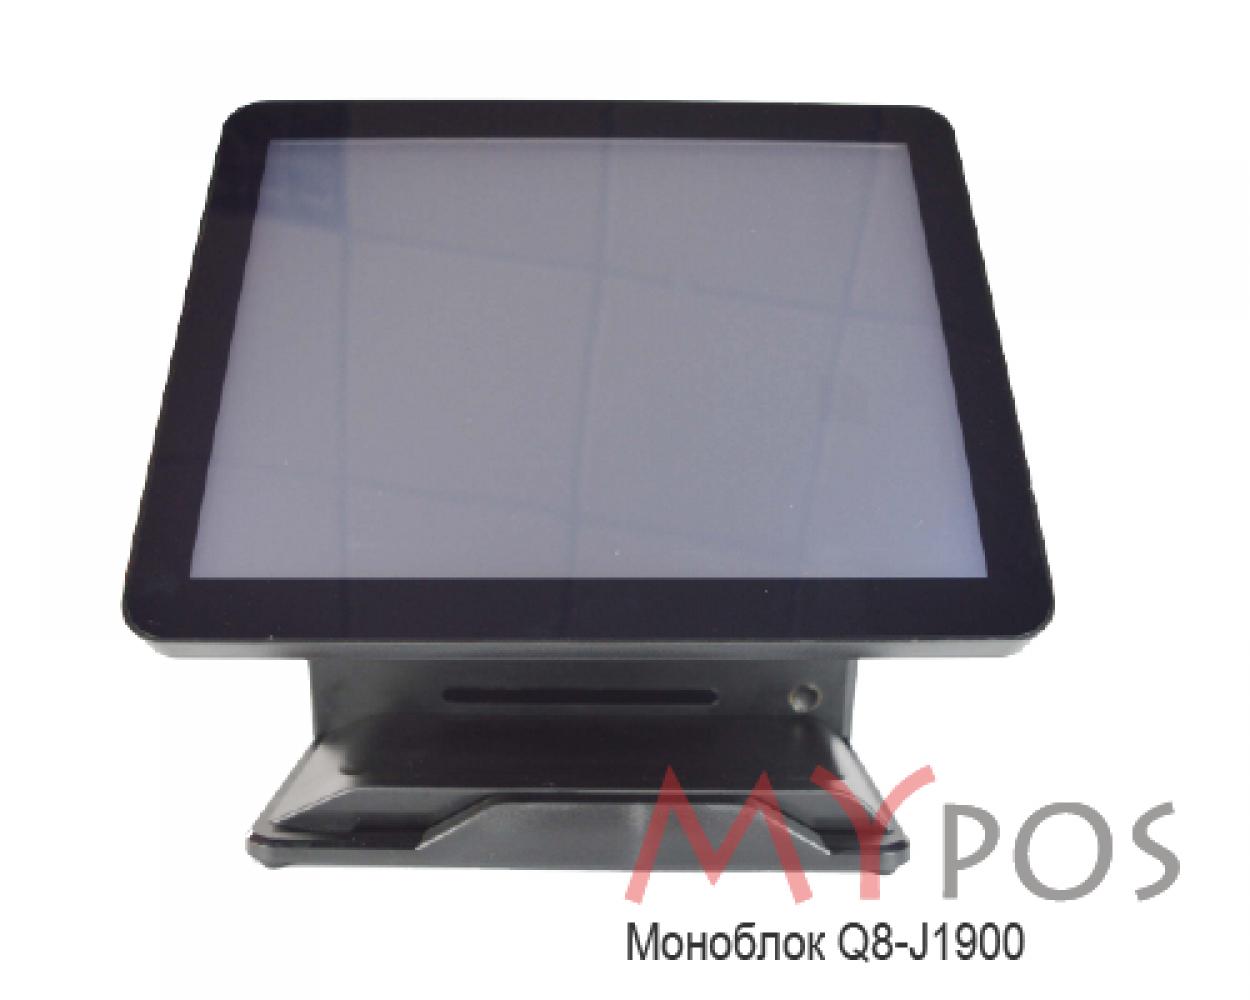 "Сенсорный POS-компьютер моноблок myPOS Q8 15.6"" LCD, J1900, RAM 4Gb, SSD 120Gb, 6 USB, 2 RS232, VGA, HDMI, без ОС"